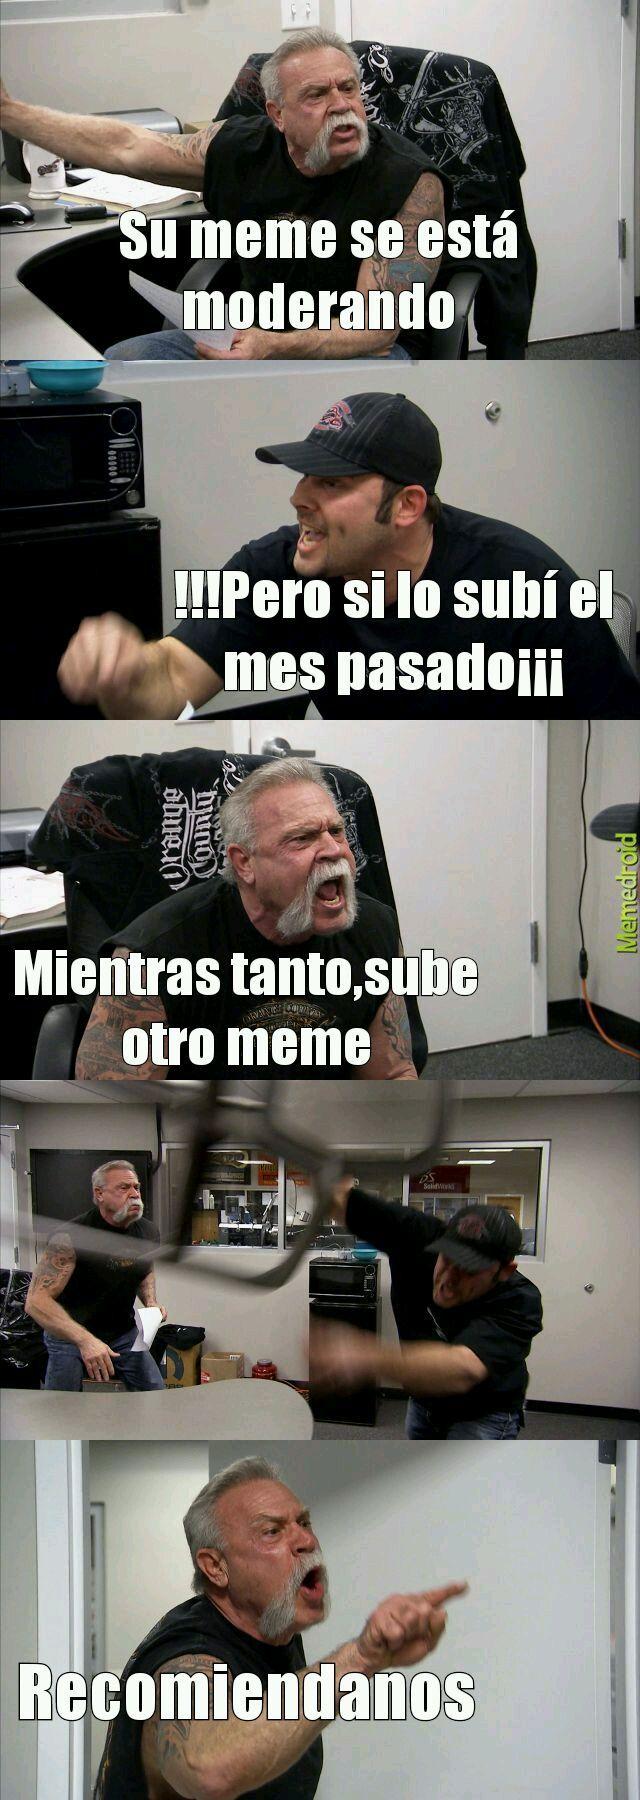 Jxydhdjuvdnfhzjd - meme